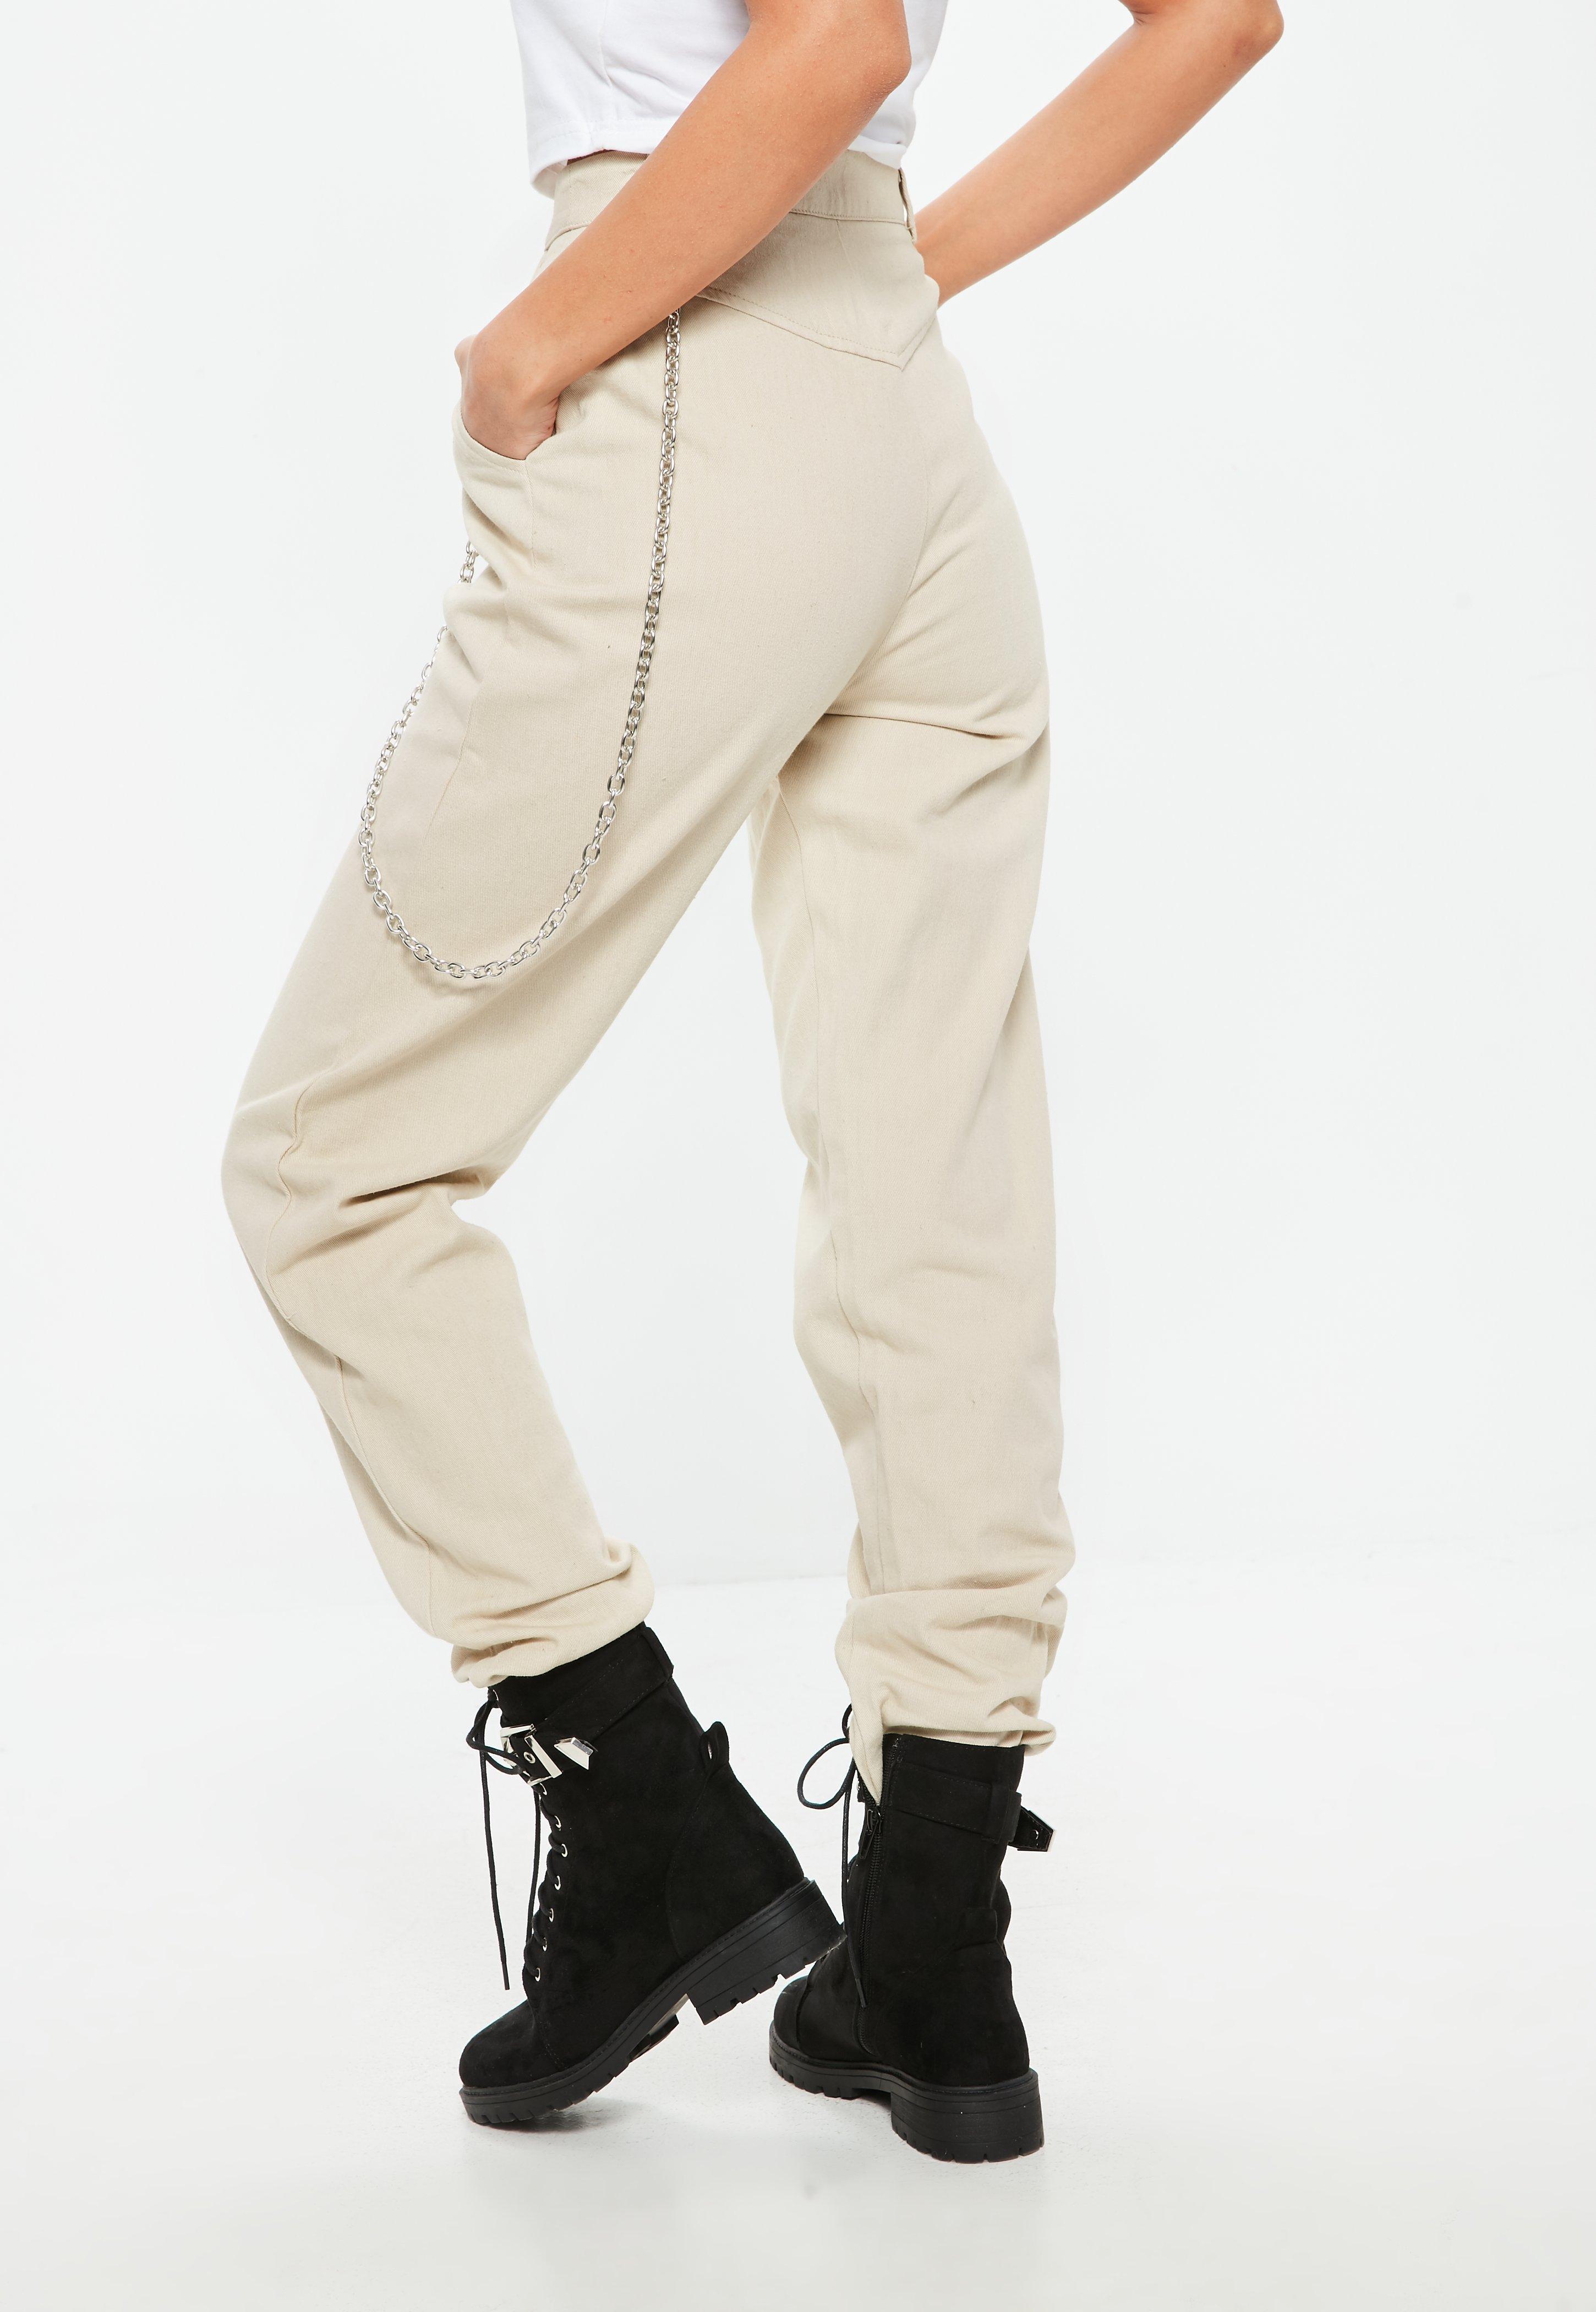 bdcd7ba1 Missguided - Natural Petite Beige Chain Detail Cargo Trousers - Lyst. View  fullscreen